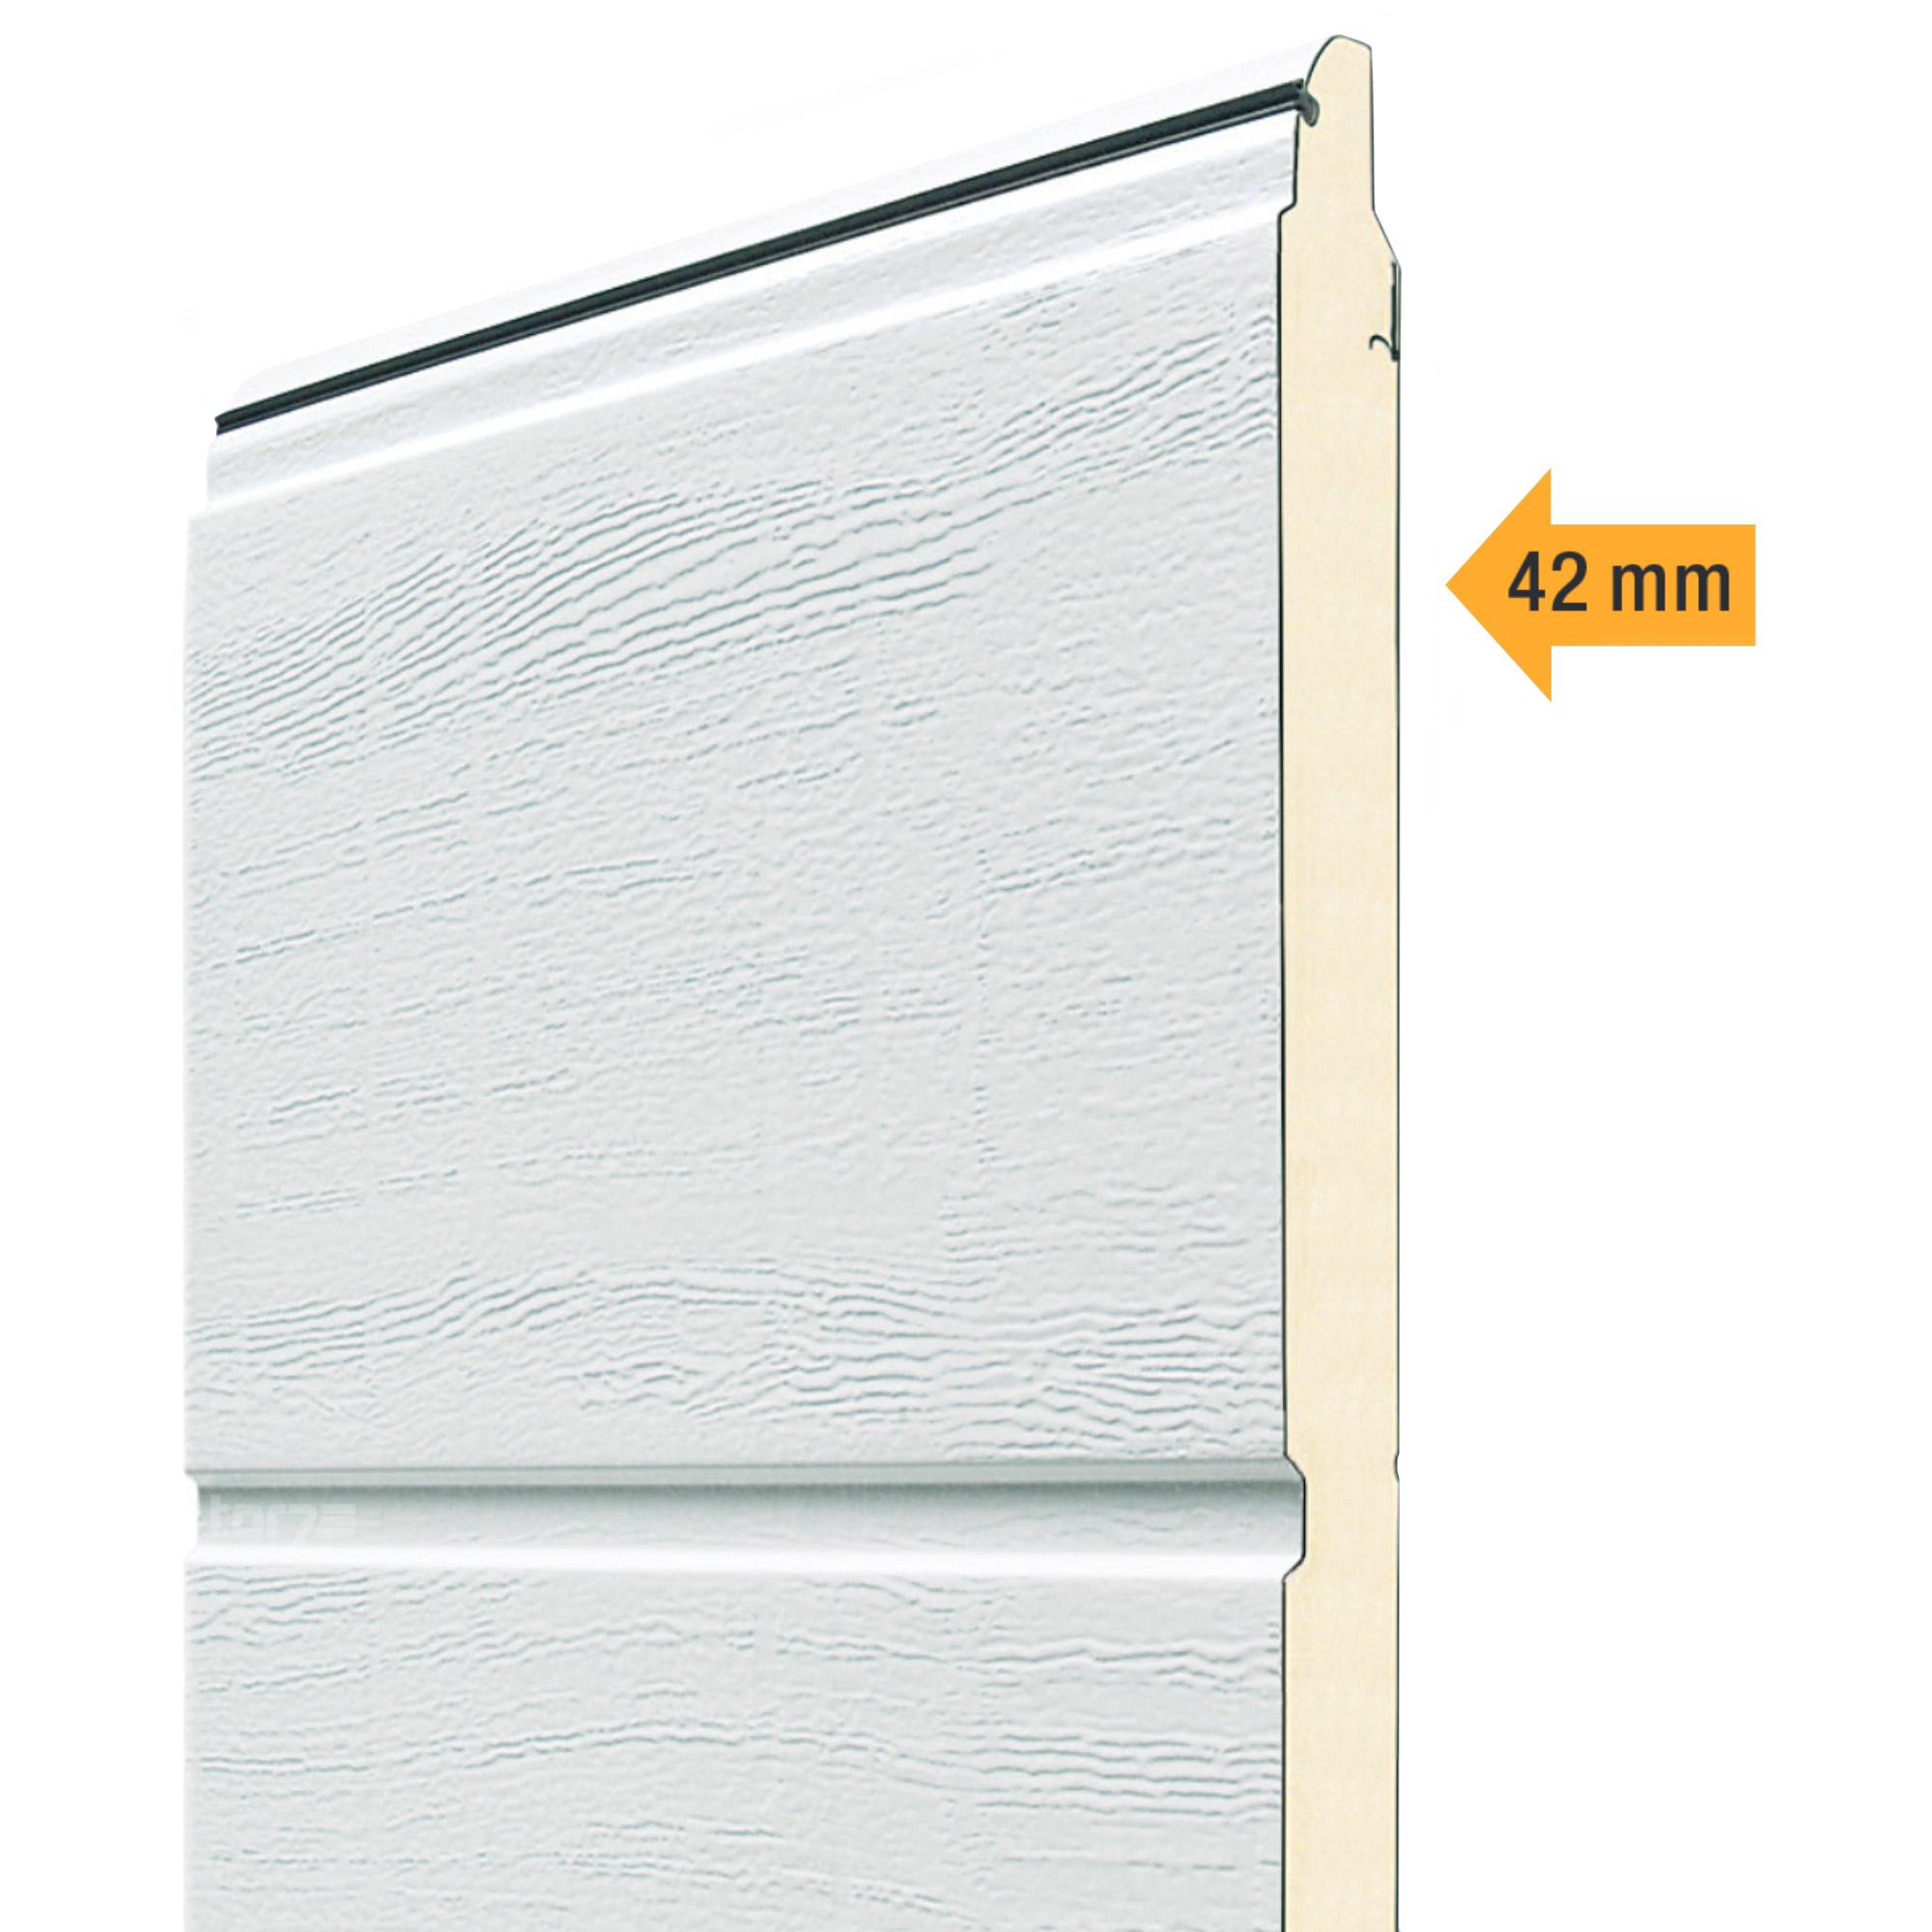 Garagentor hörmann braun  Hörmann Sektionaltor 5000 x 2250 mm inkl. Garagentorantrieb